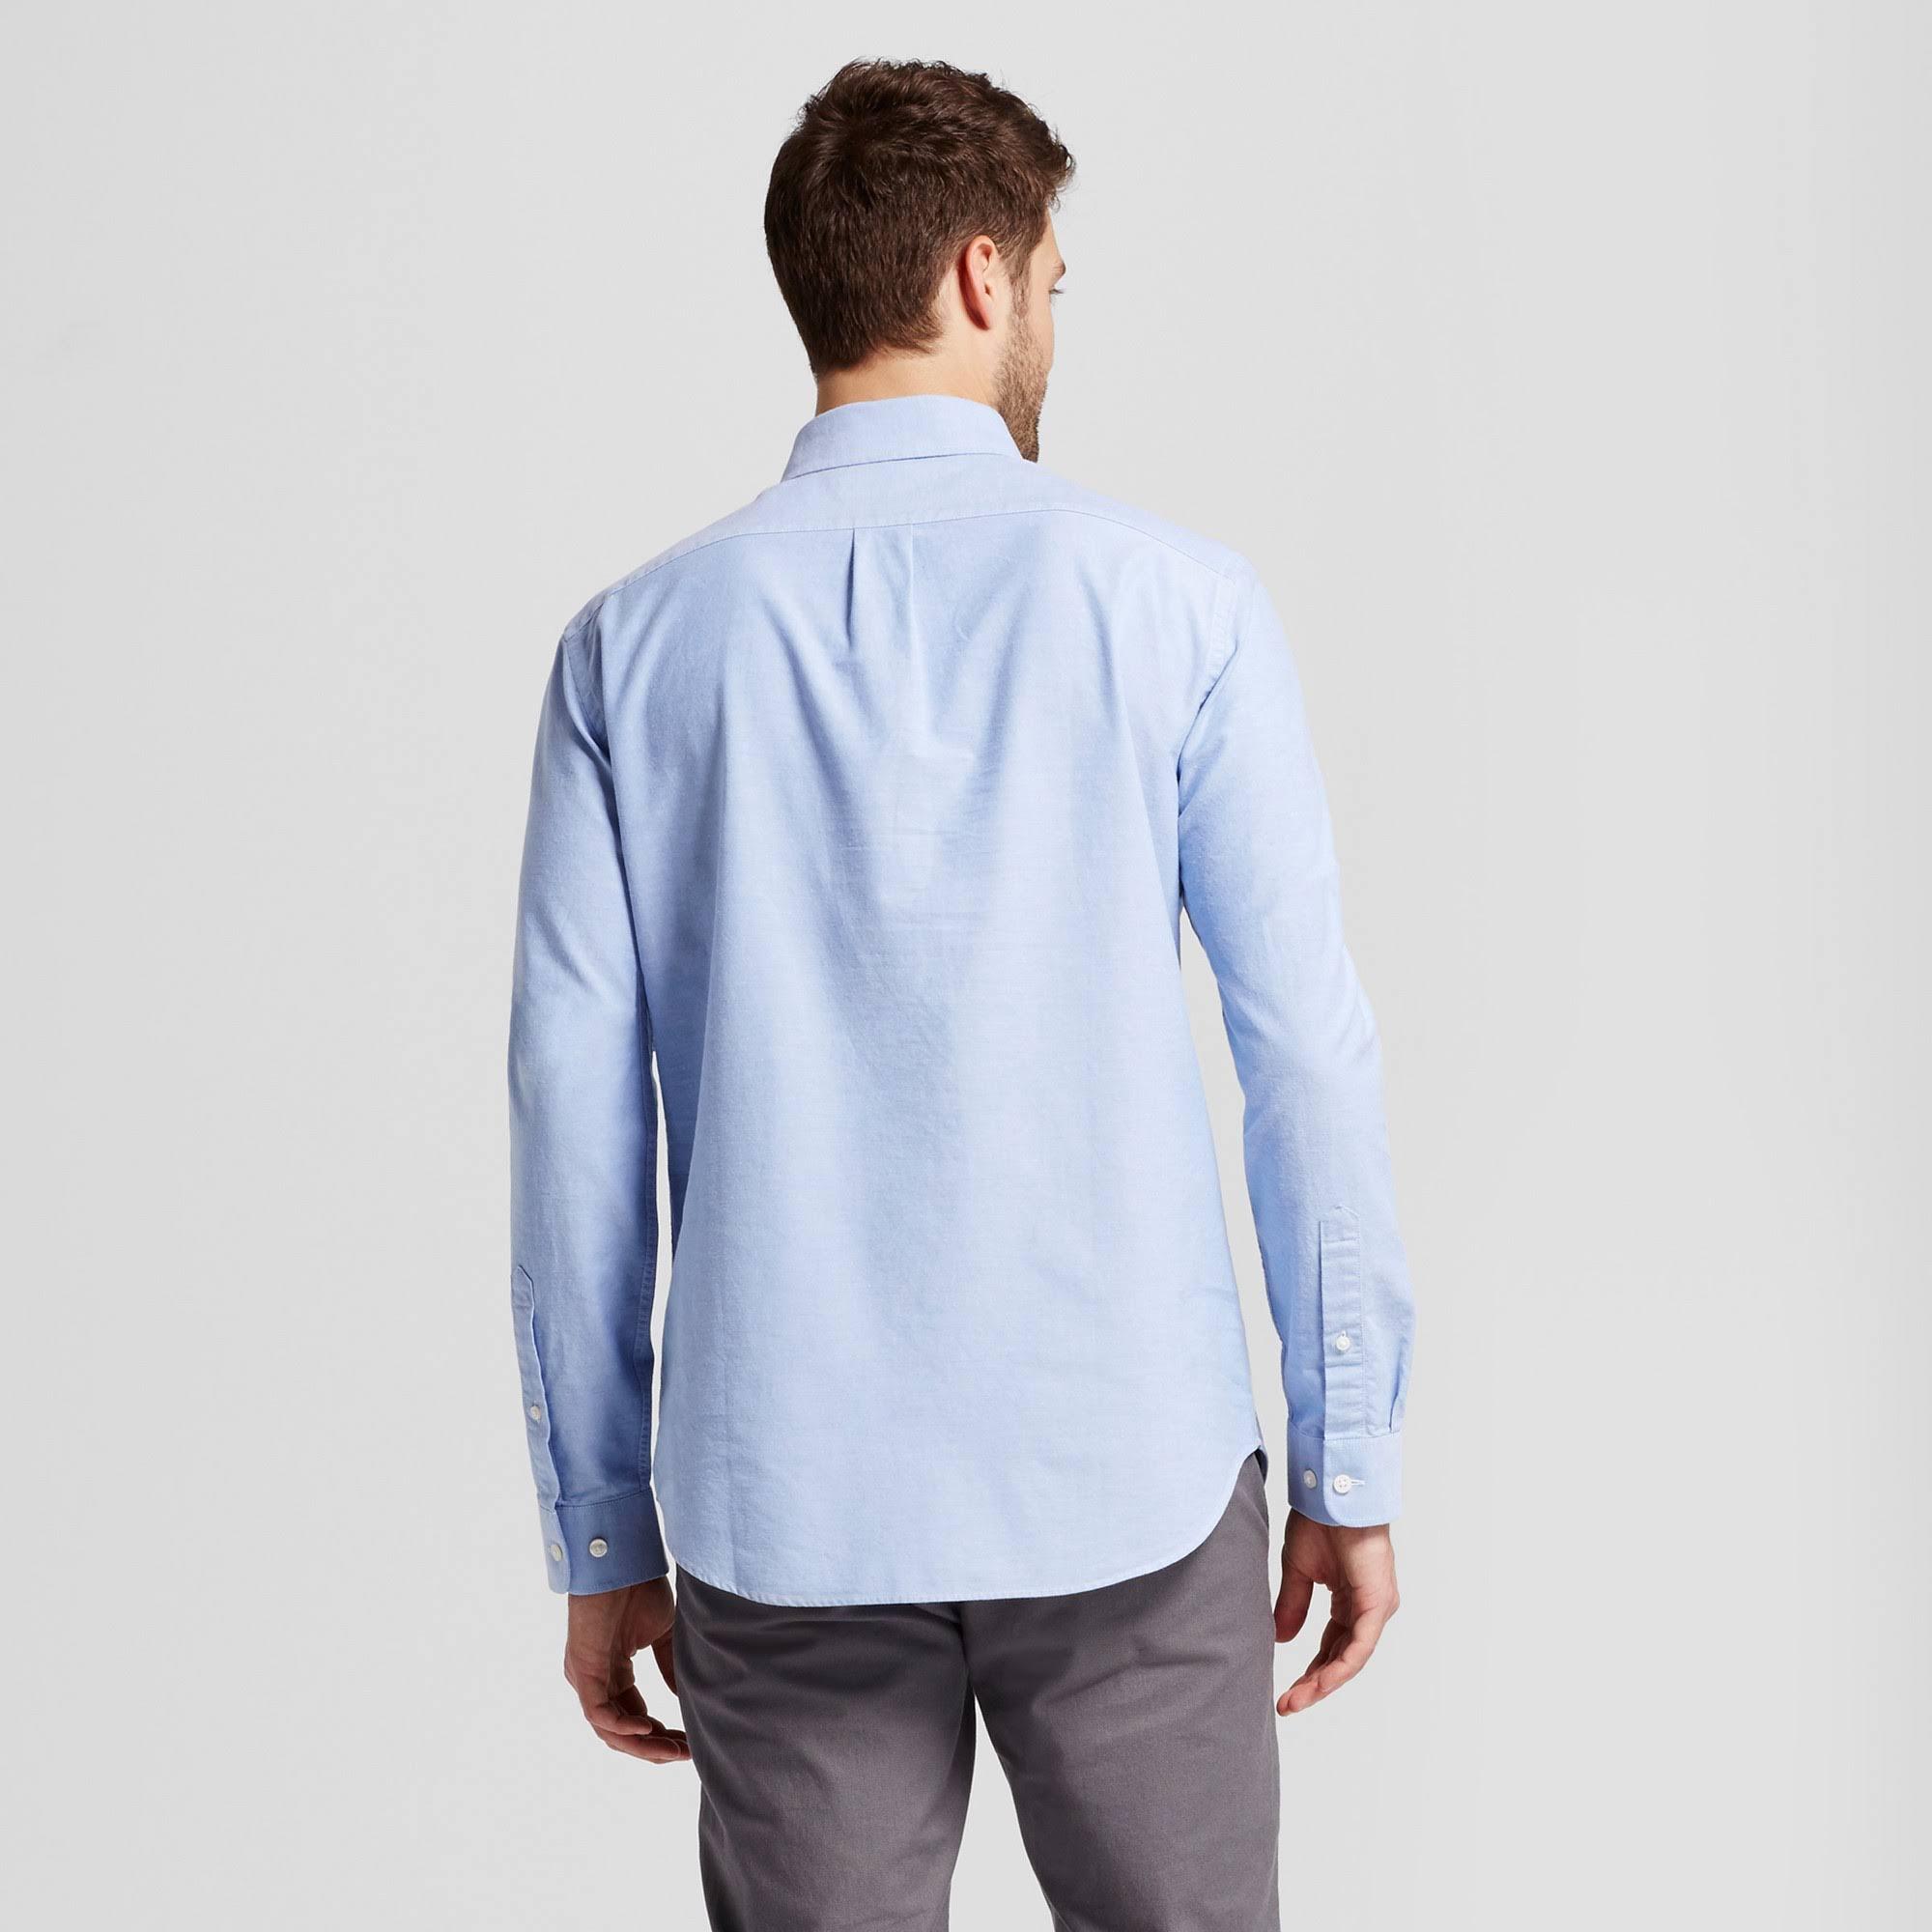 hemd Co Xxl Standard Hellblau Oxford Whittier Fit Goodfellow amp; down Button Herren dwZ4YW7qY